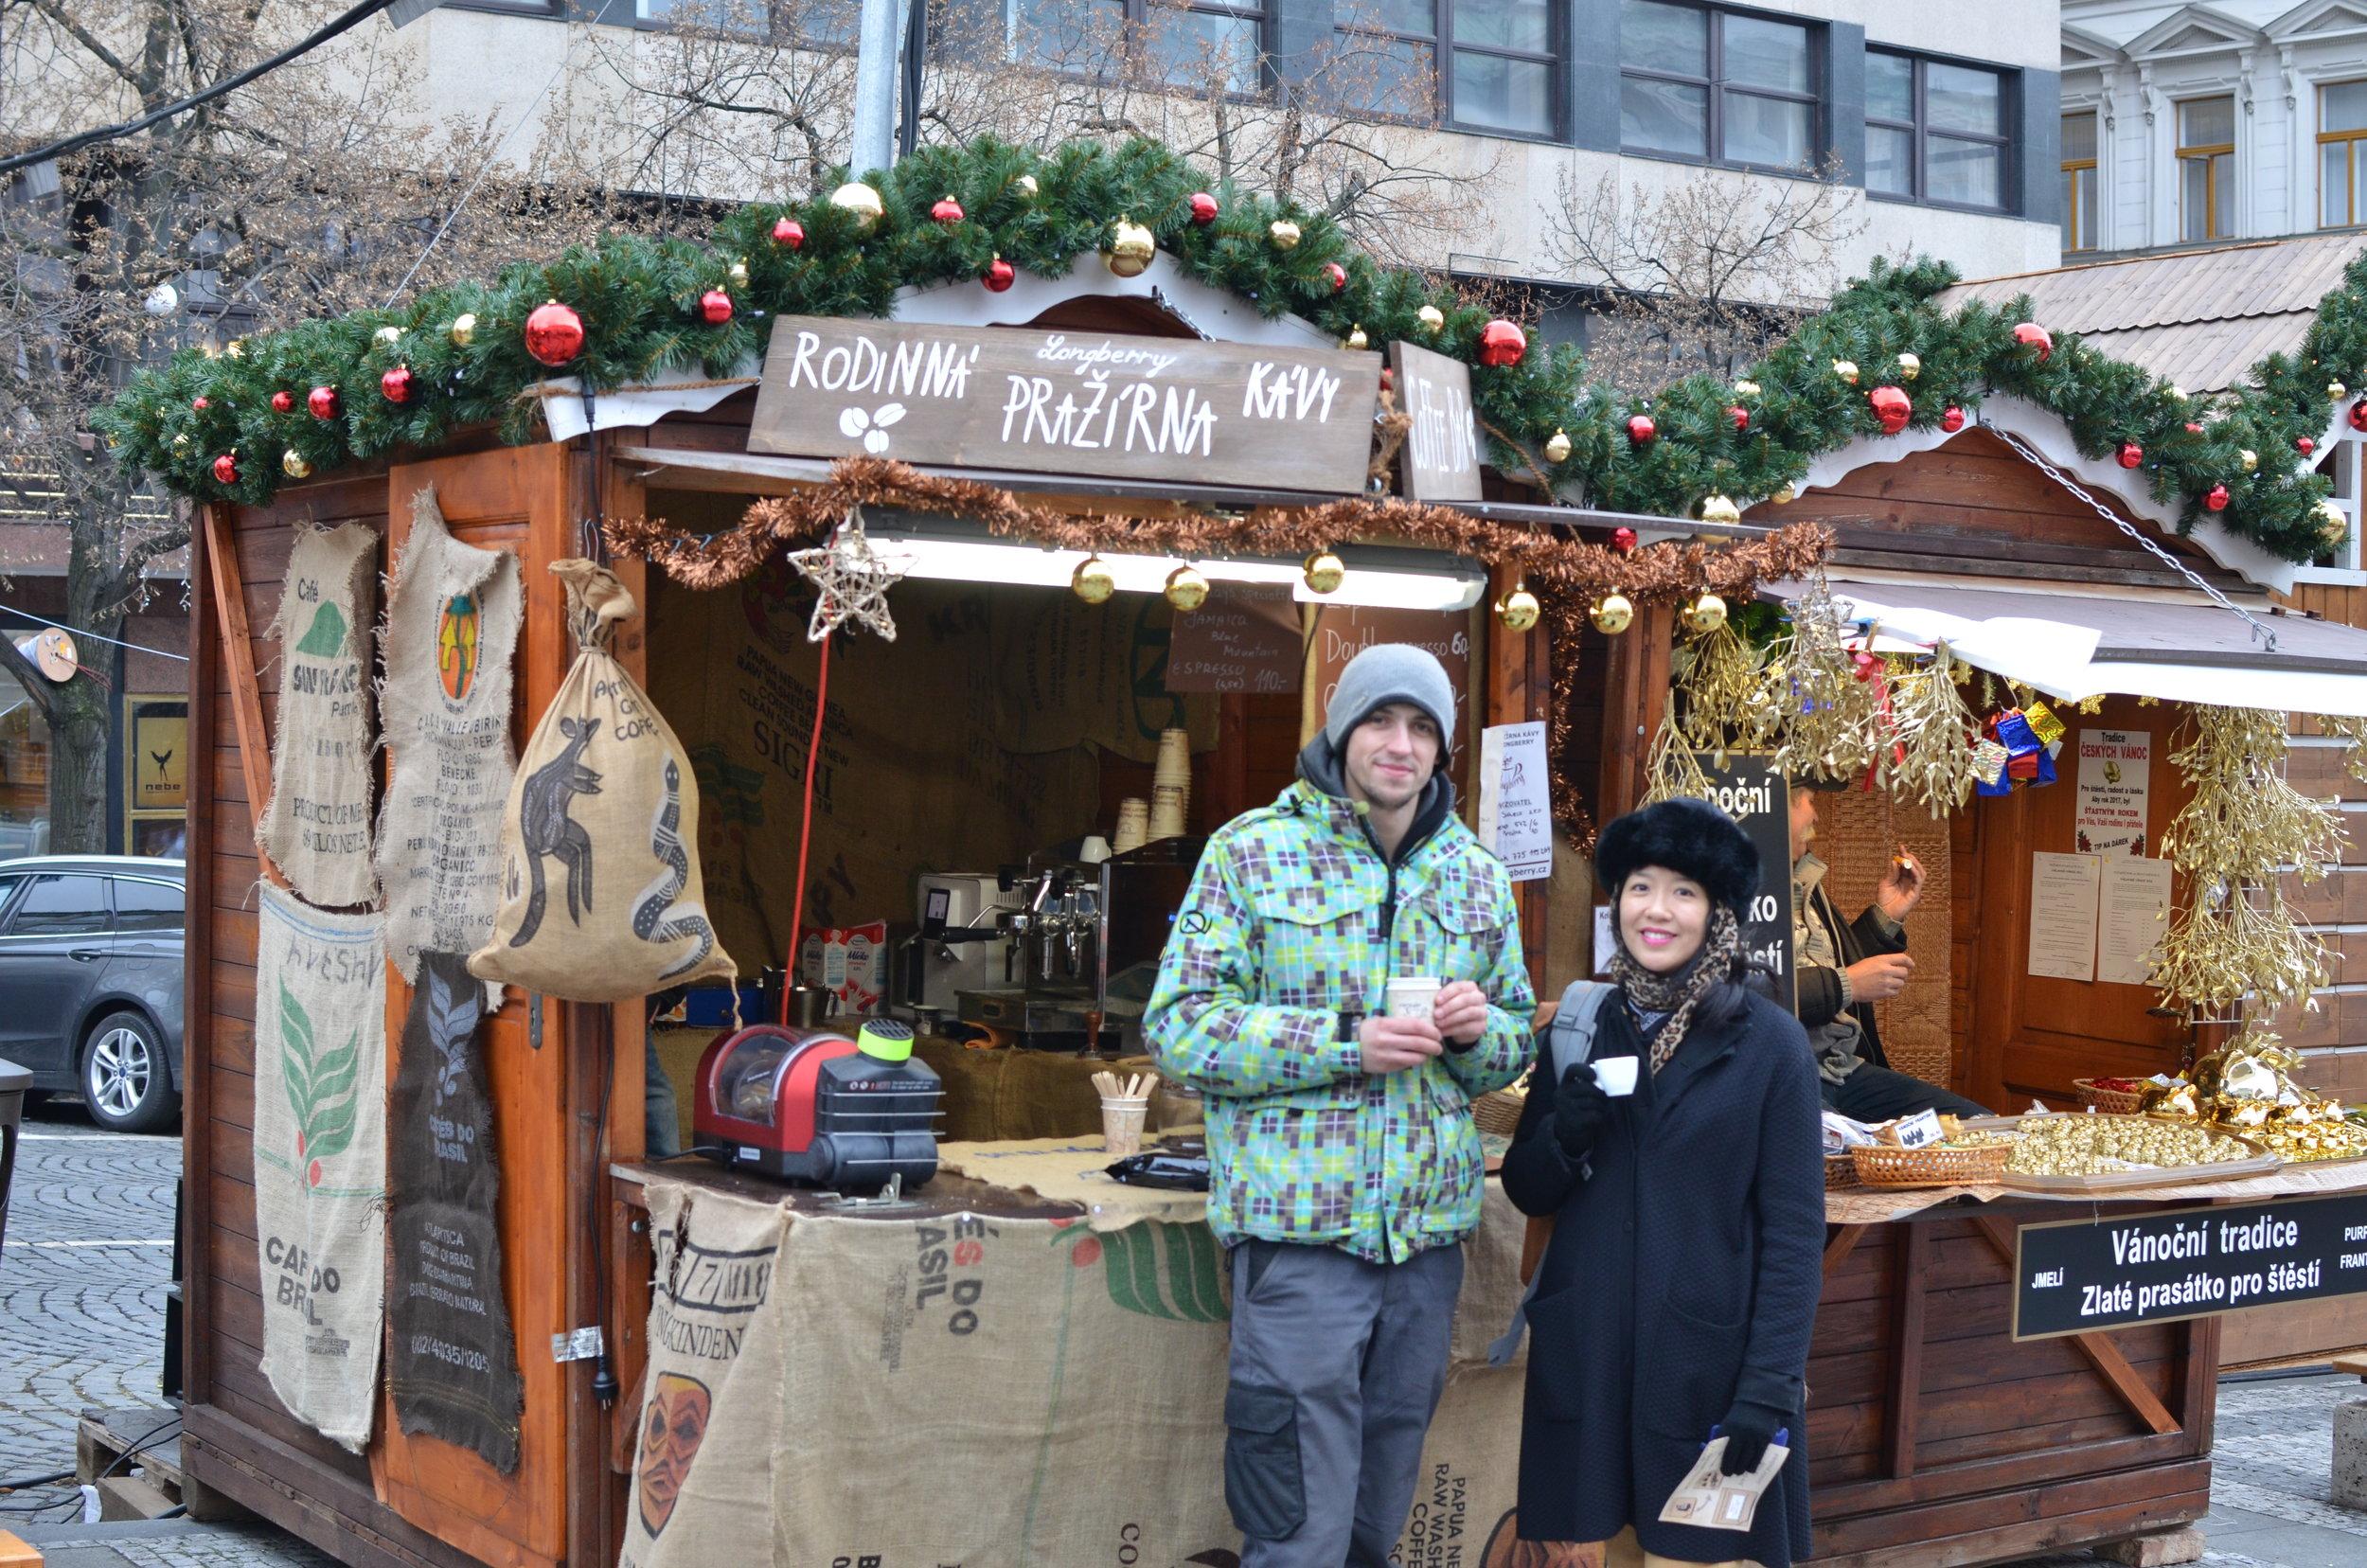 Rodinna prazirna Kavy (market coffee)